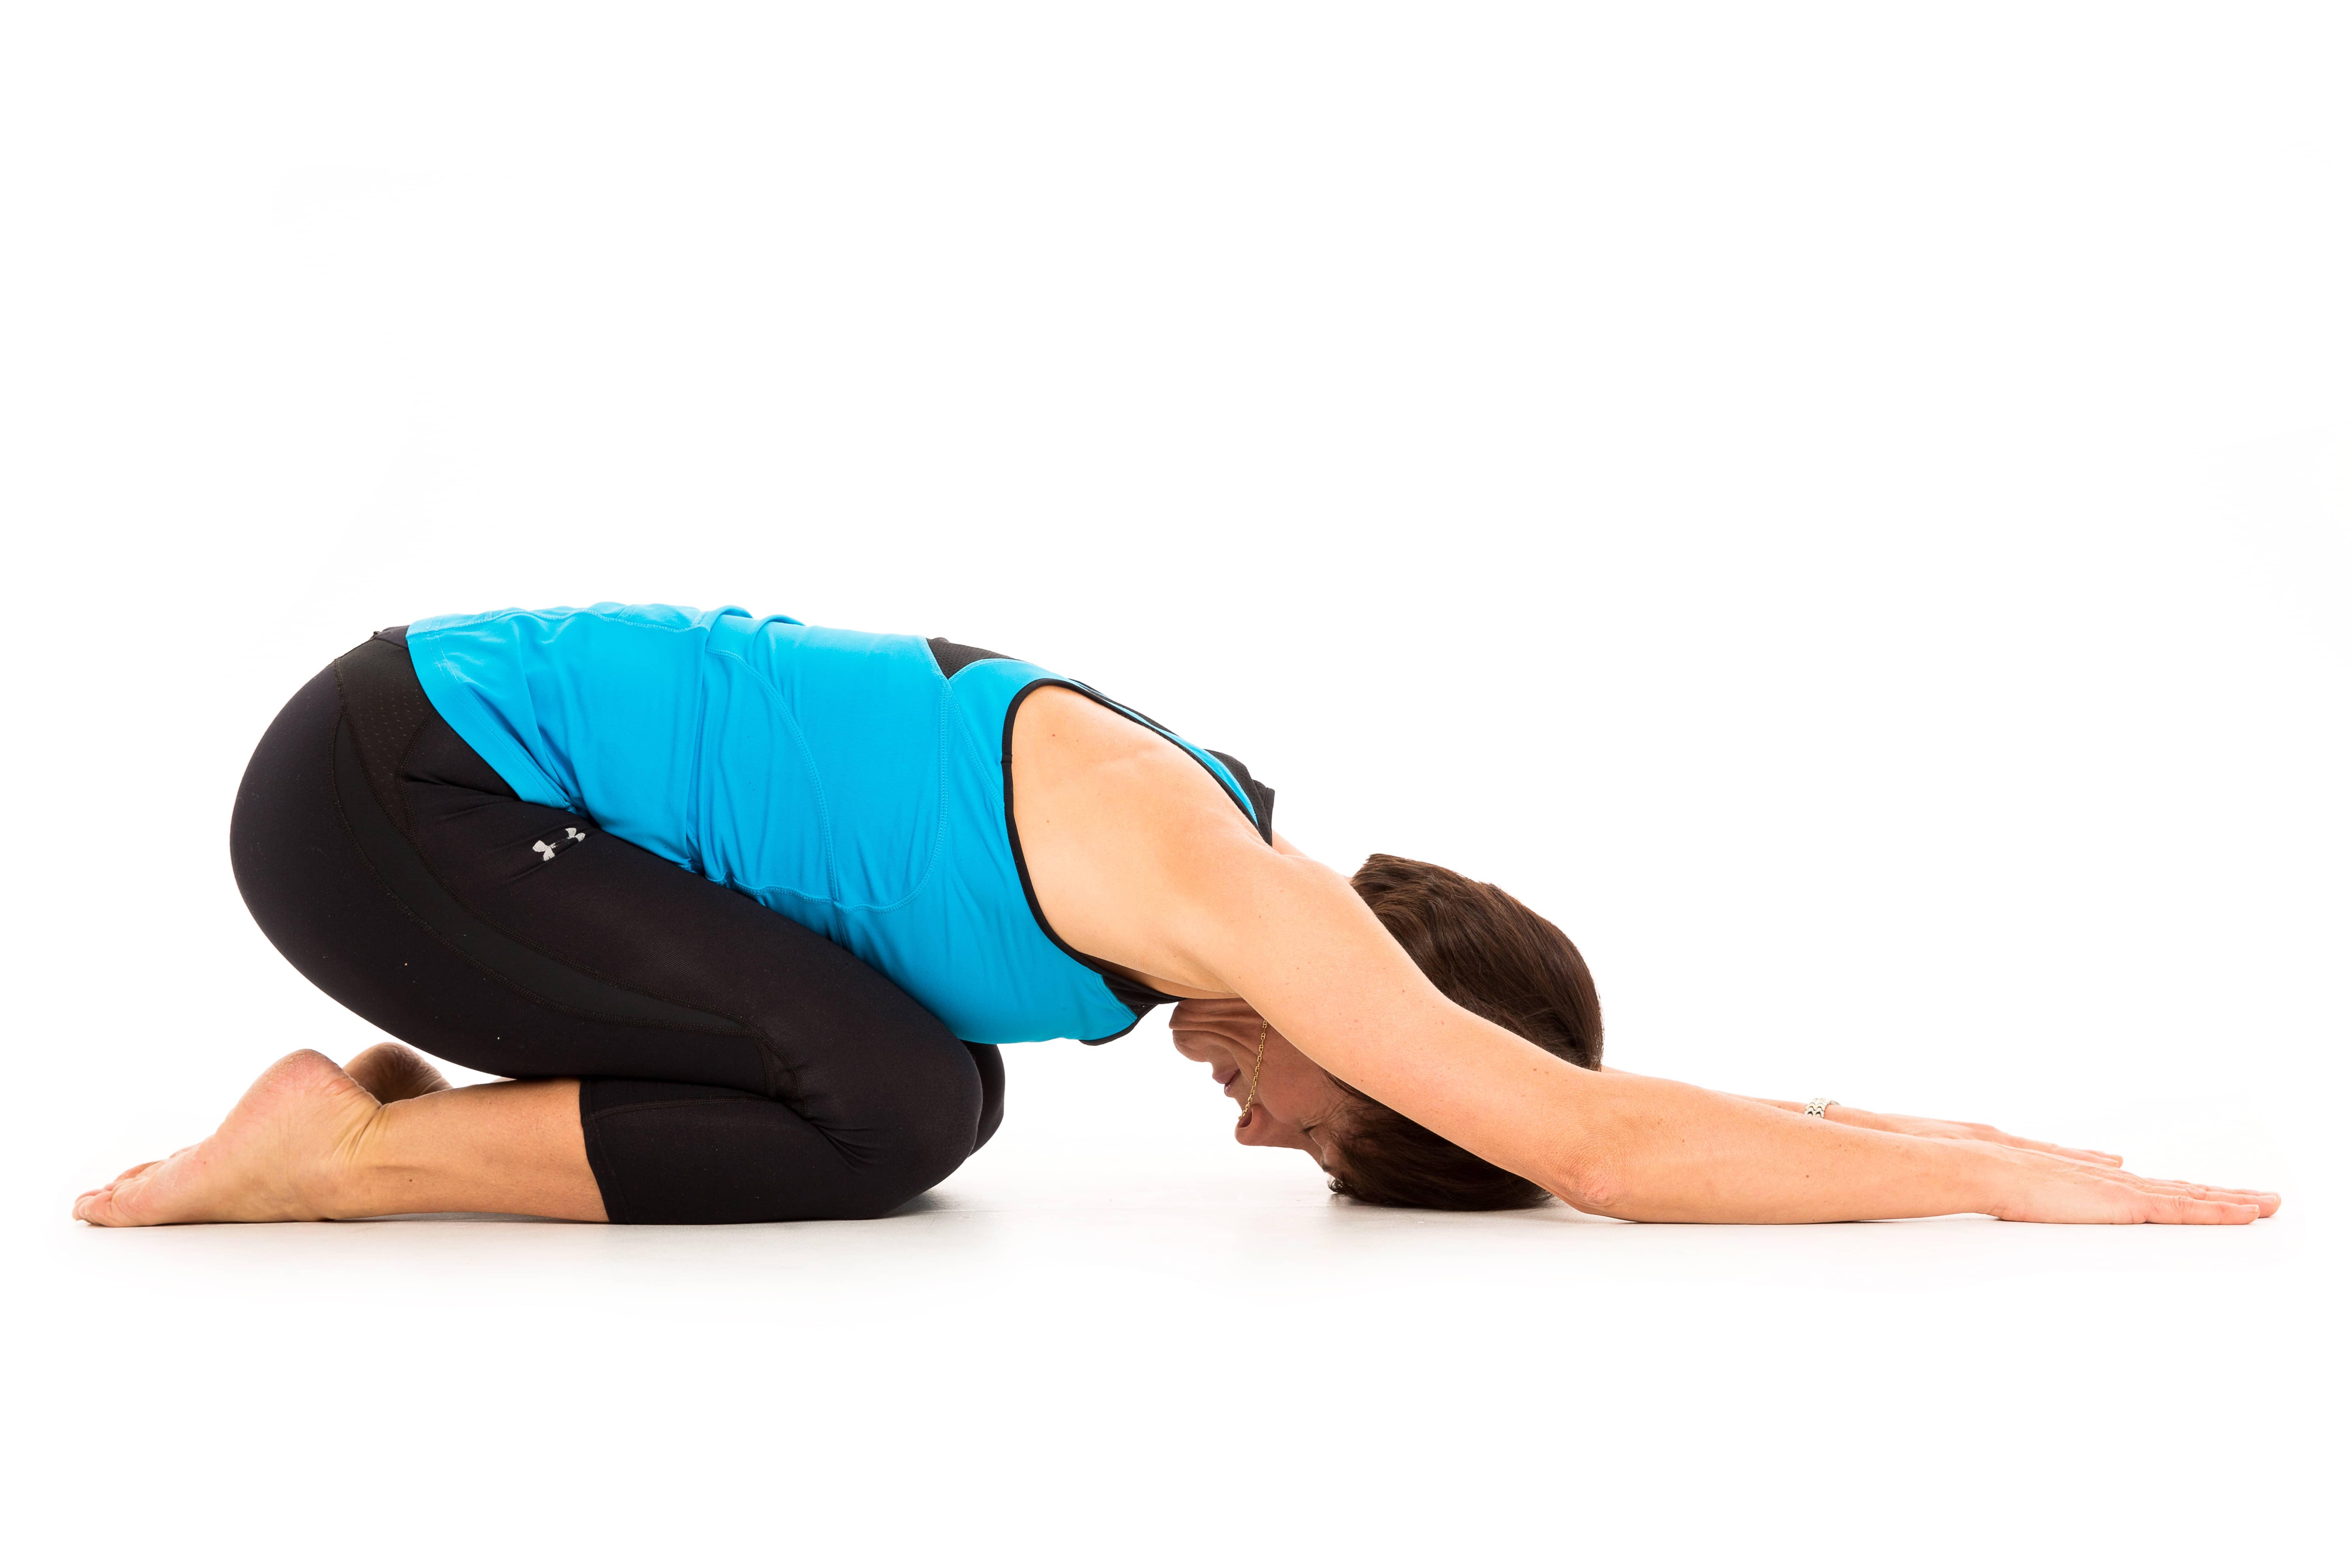 Tessa performing pilates